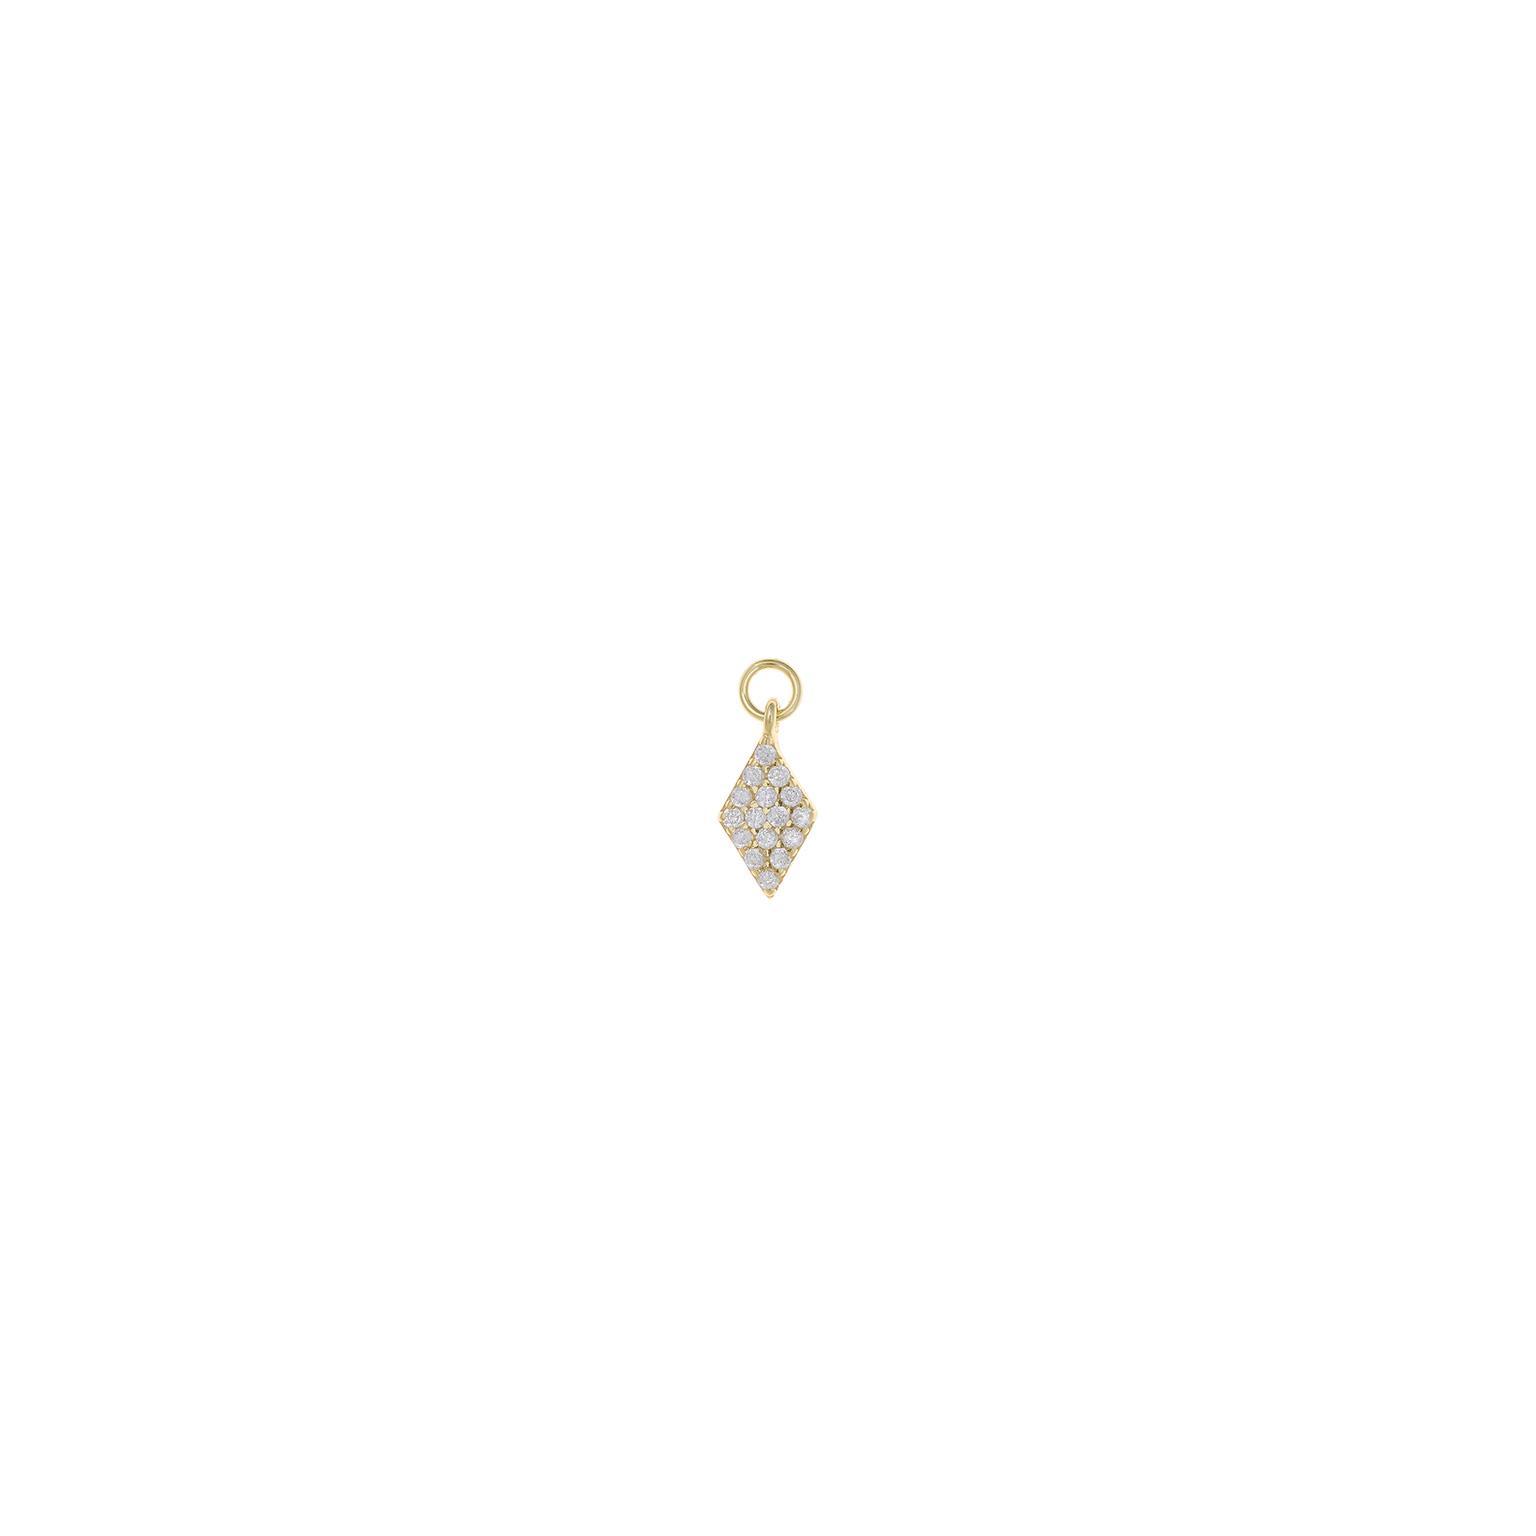 Charm  plata Salvatore rombo con circonitas blancas dorado